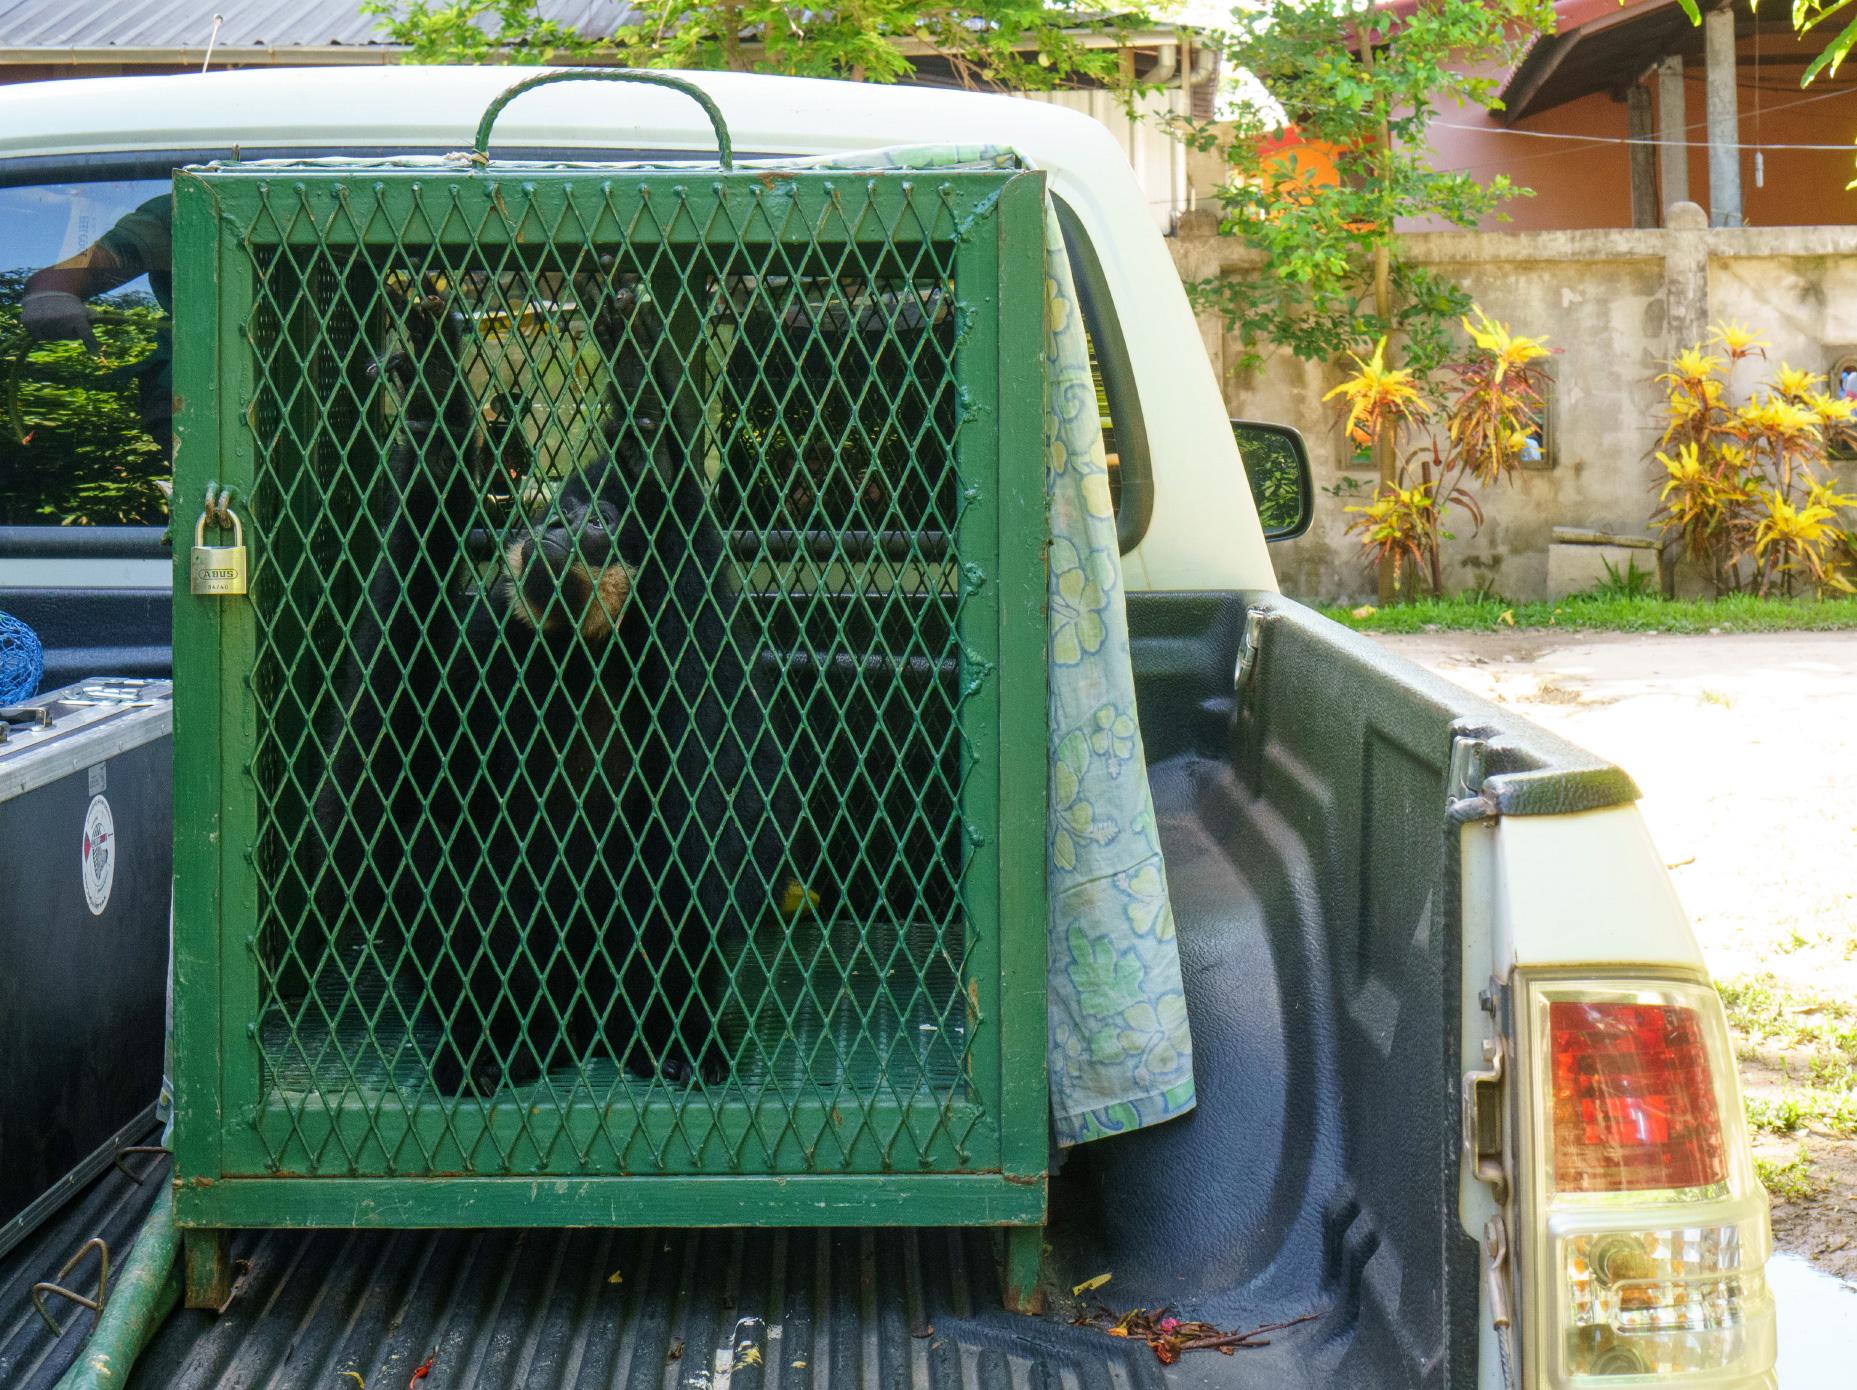 A gibbon awaiting release